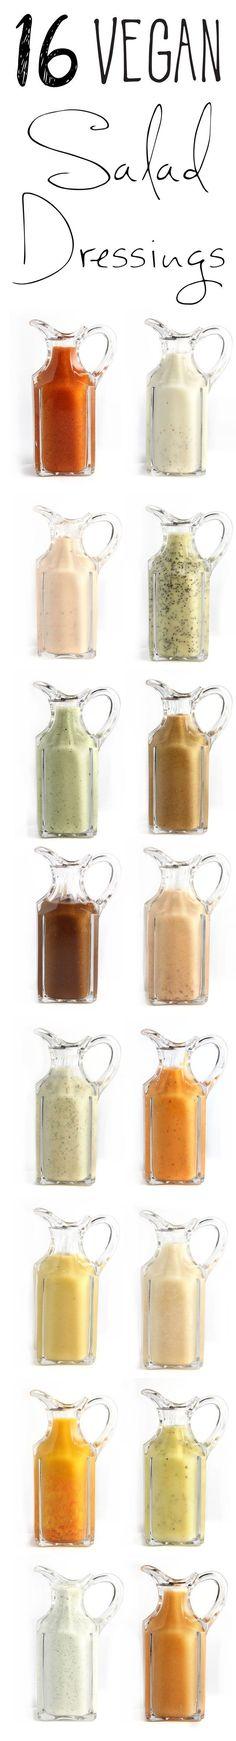 16 Vegan Salad Dressings!! All the classics made vegan, plus a few more great ideas. #itdoesnttastelikechicken